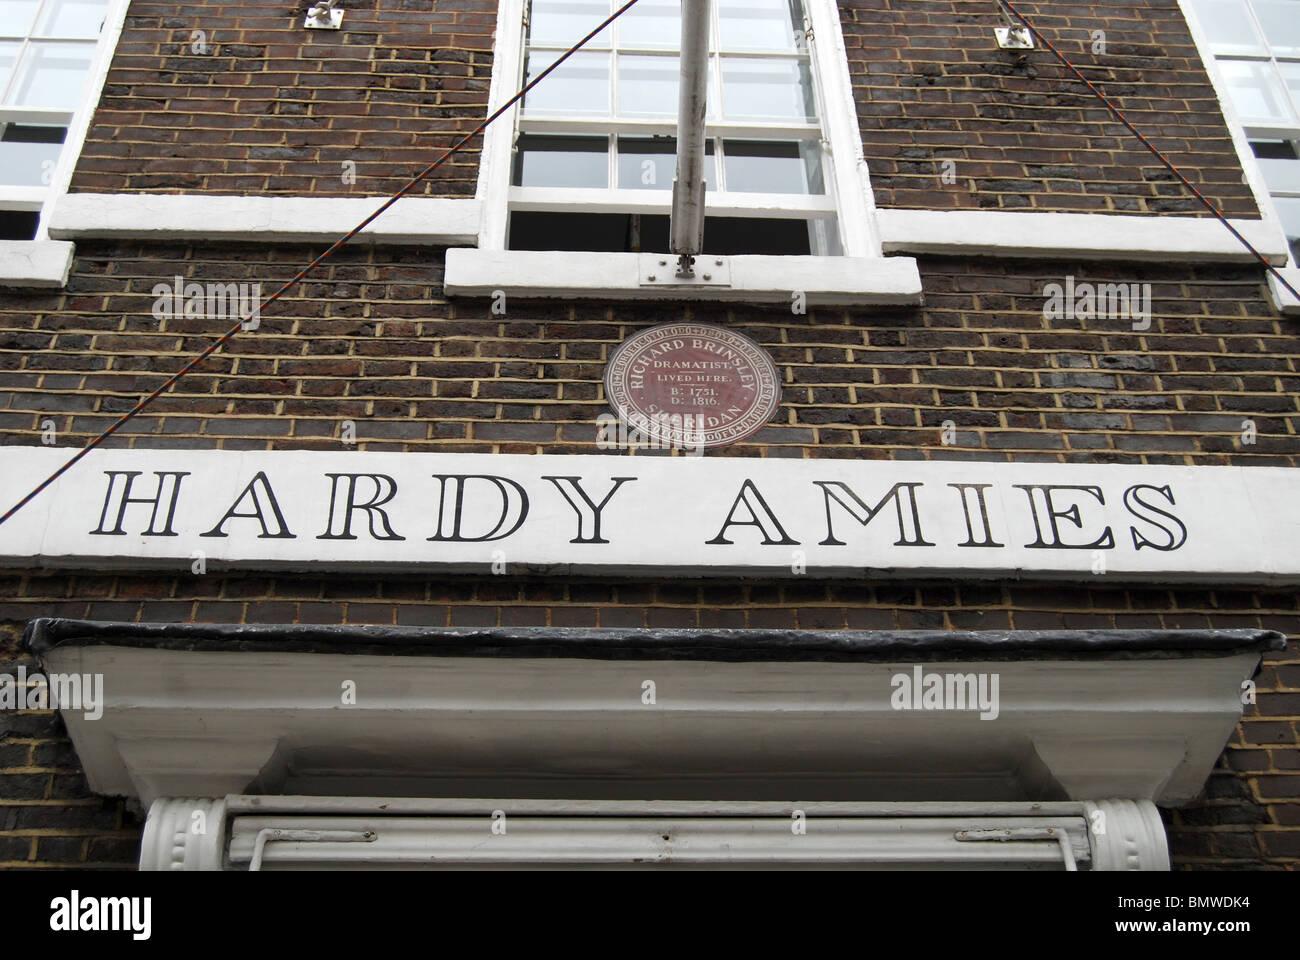 Hardy Amies Saville Row Bespoke Tailors London - Stock Image